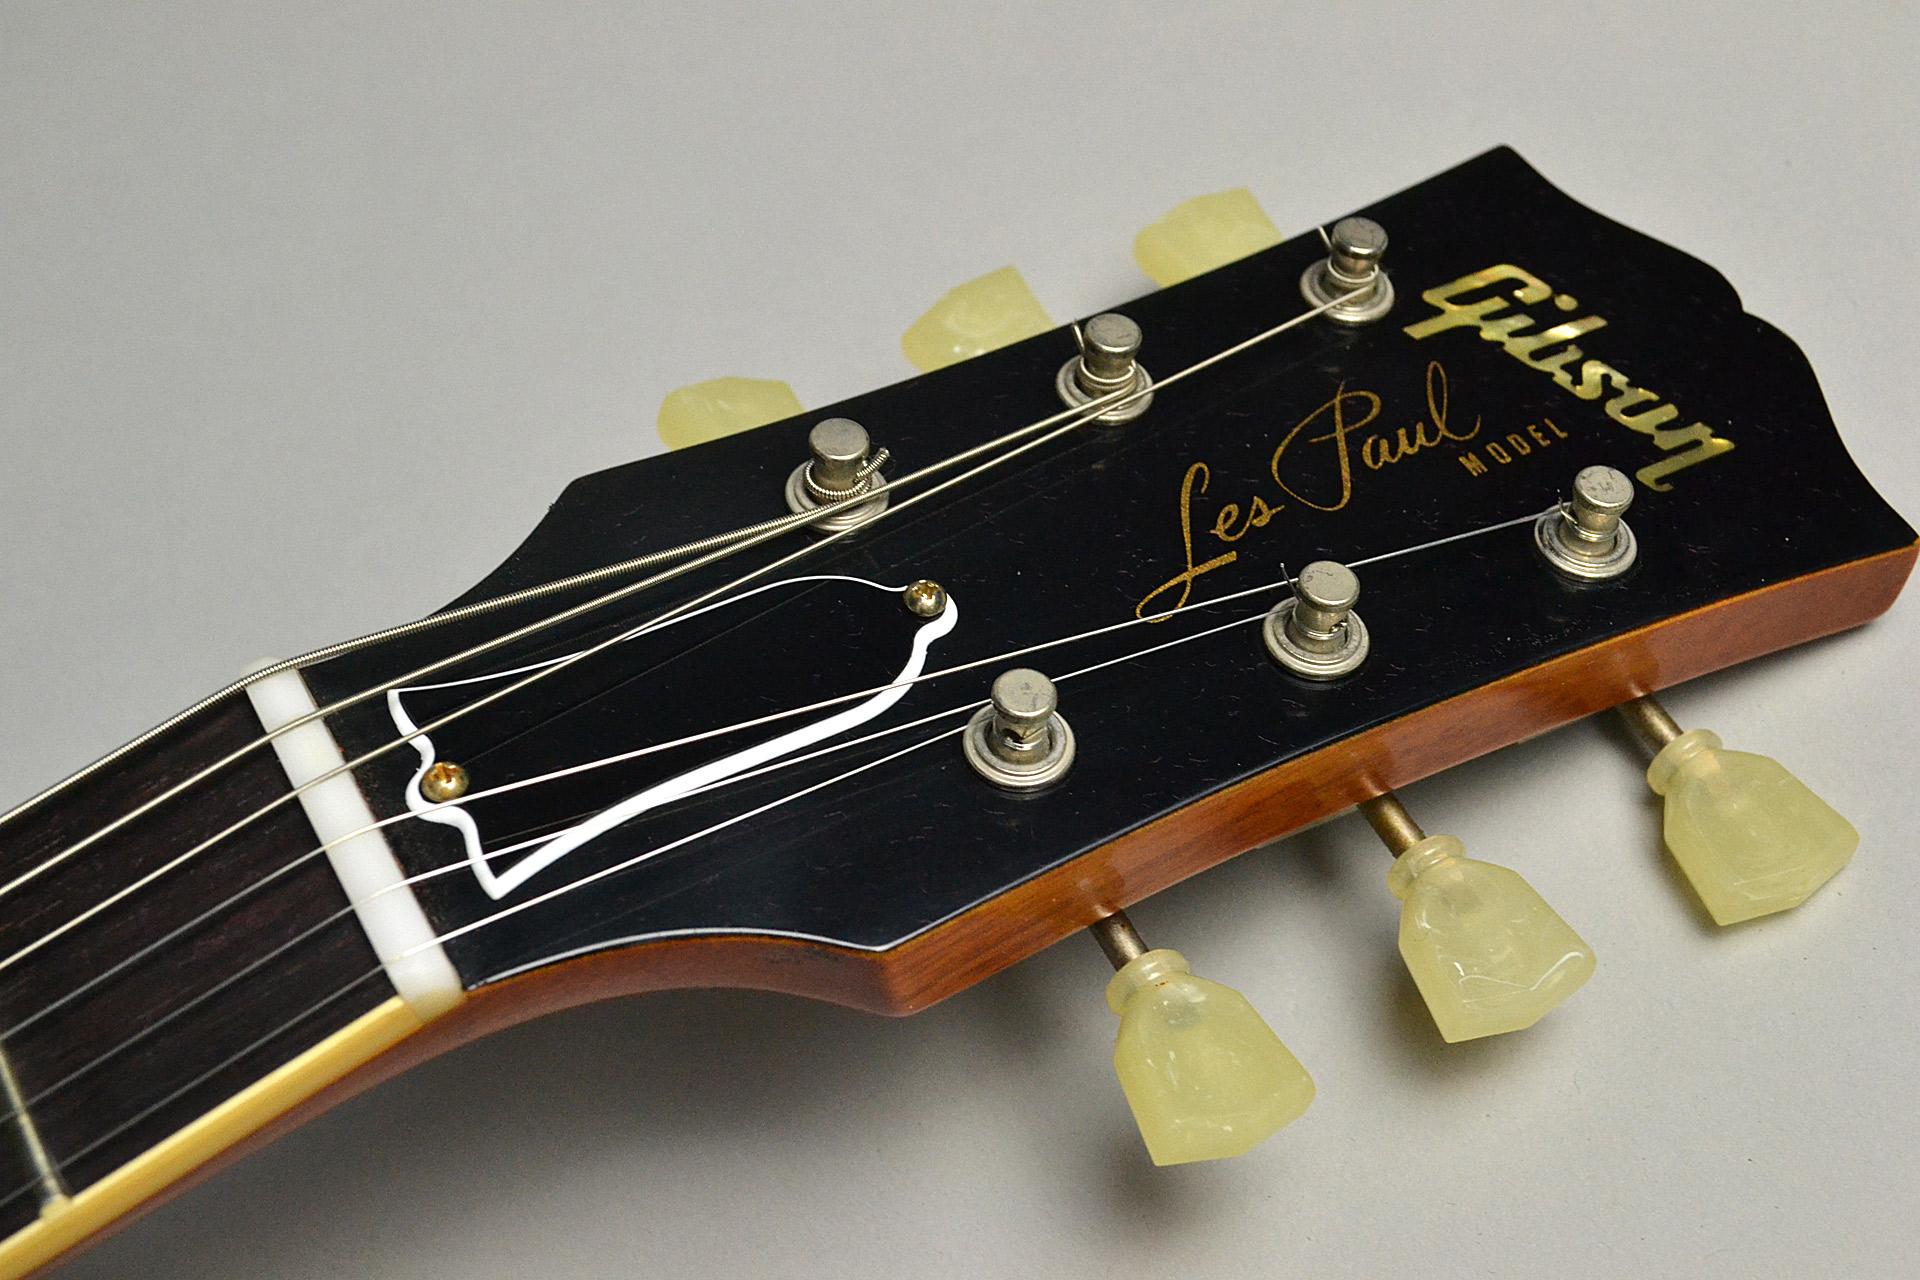 2017 Limited Run 1957 Les Paul Model Antique Goldのヘッド画像